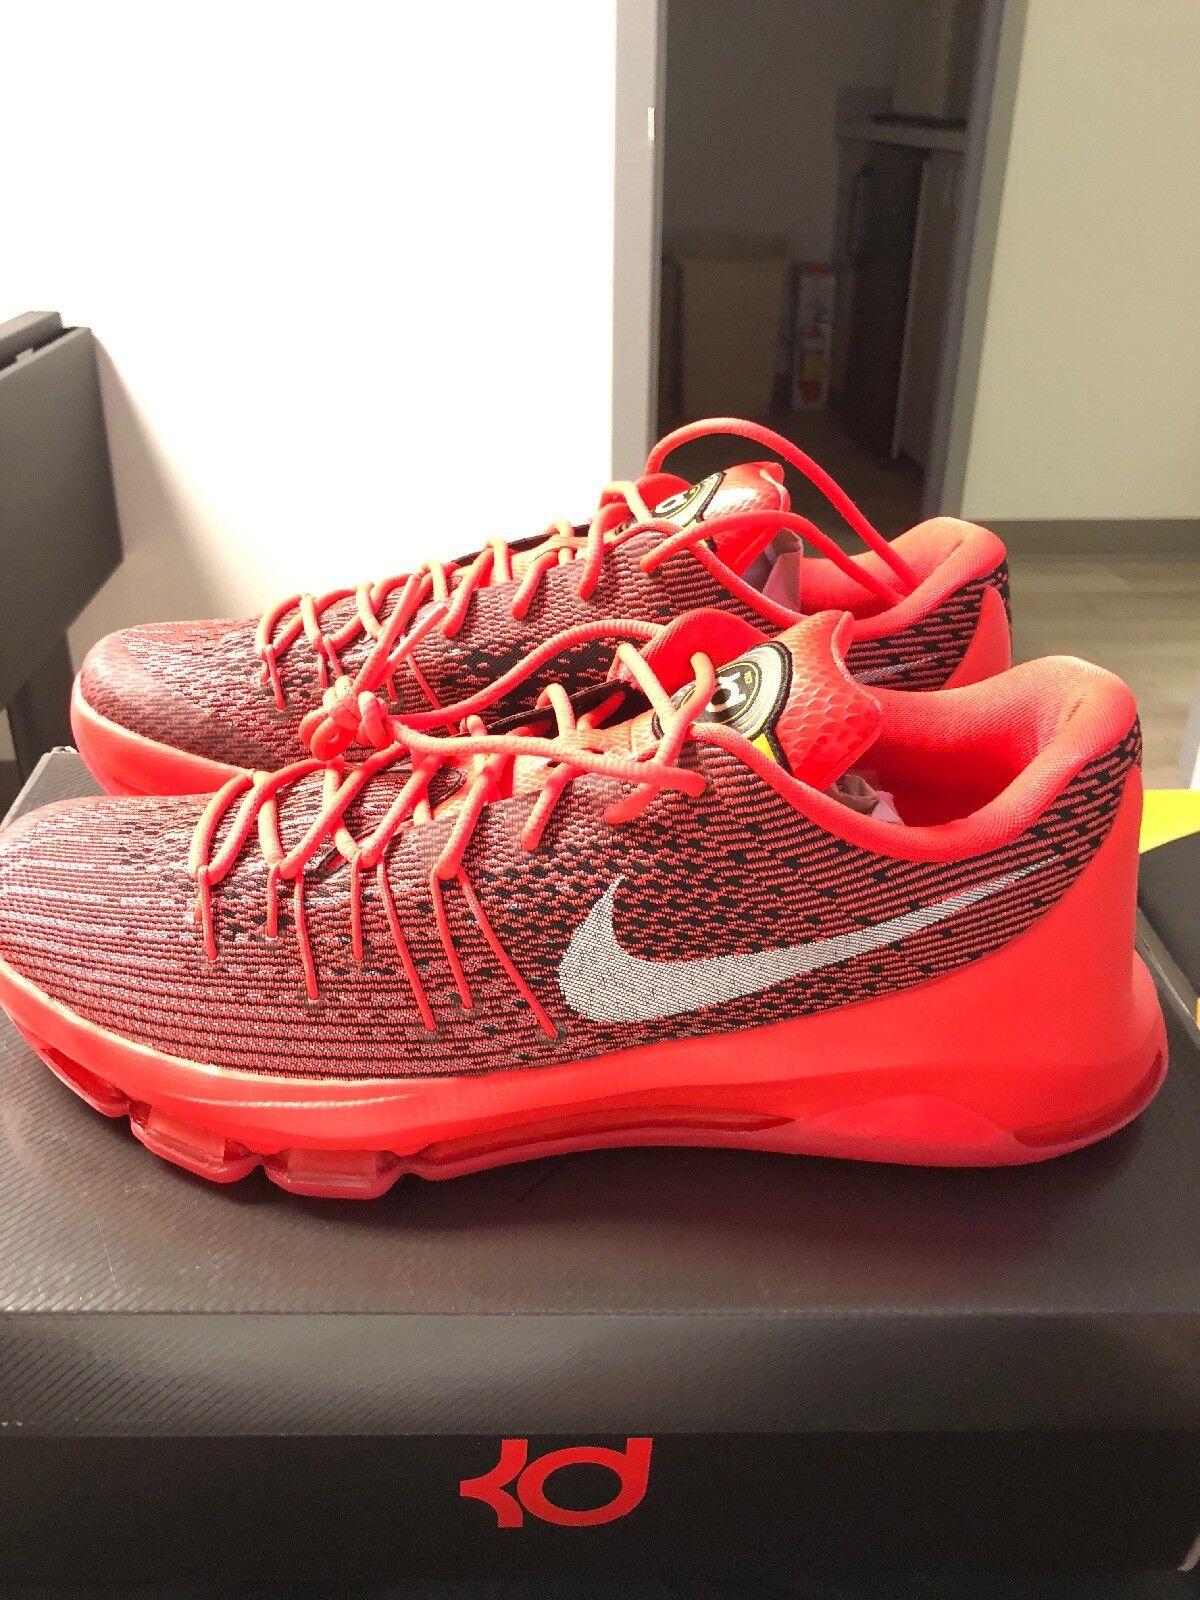 Nike KD Viii Red EYBL Ds 12